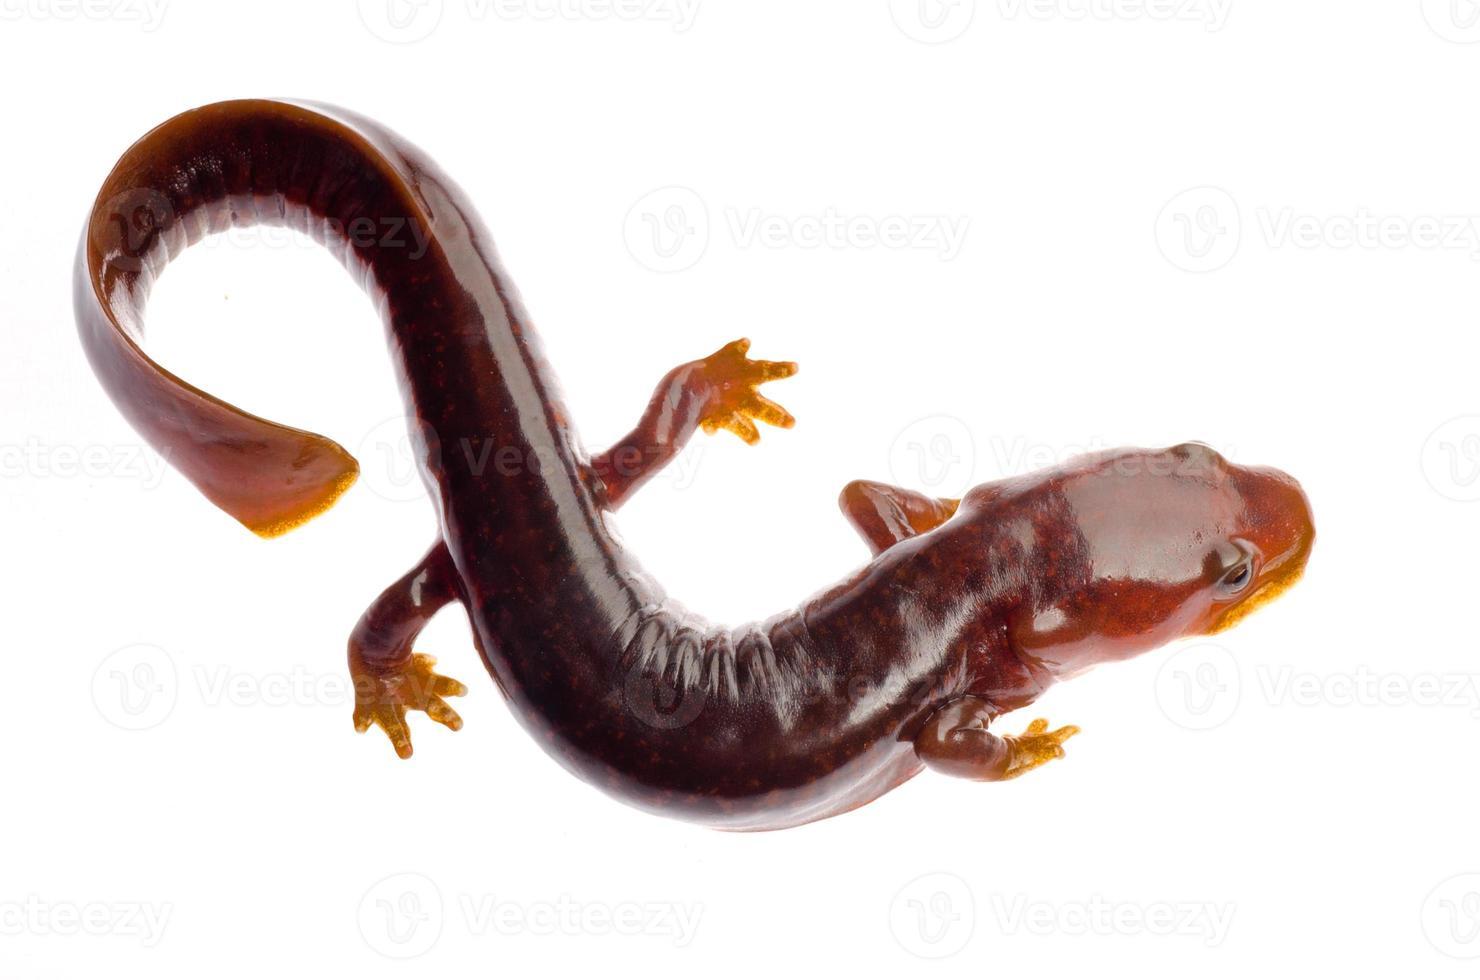 chinesischer Tsitou Salamander Molch foto